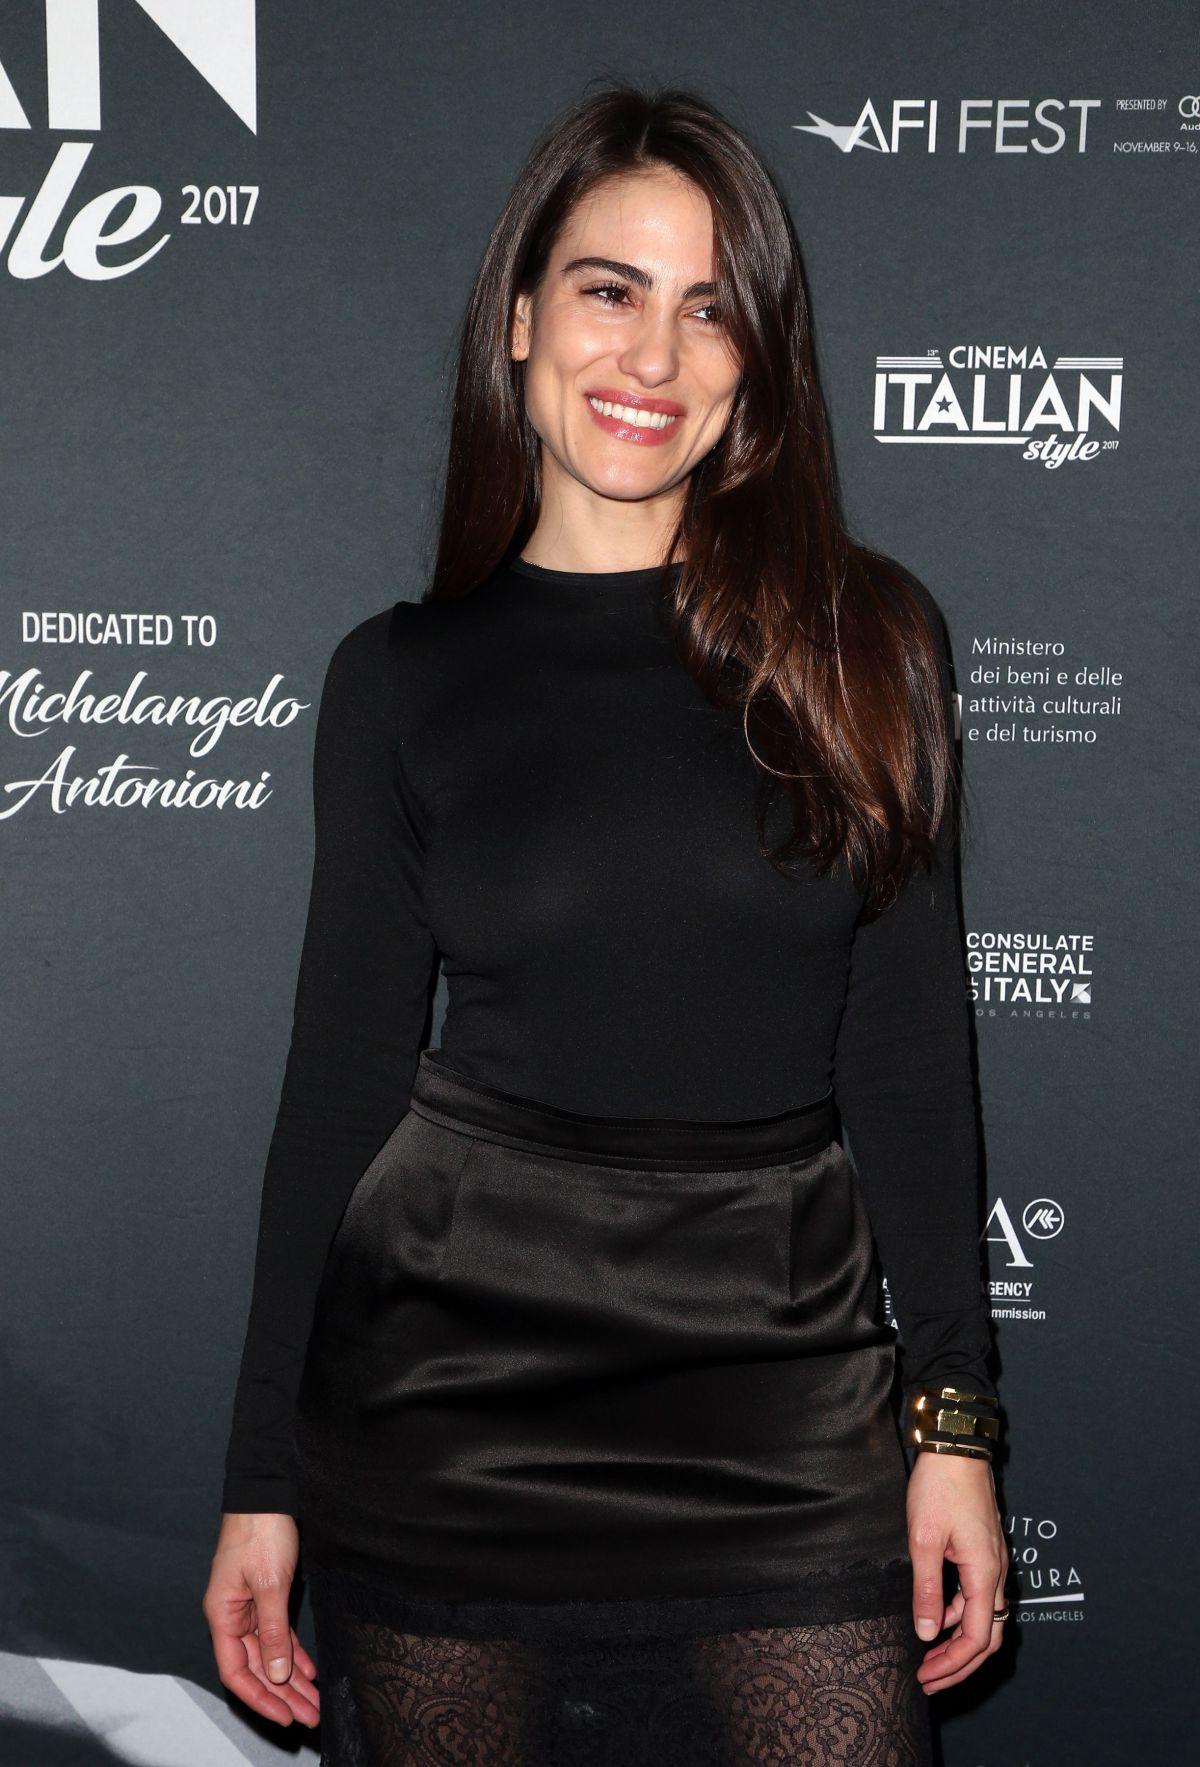 Luisa moraes a ciambra screening cinema italian style in los angeles